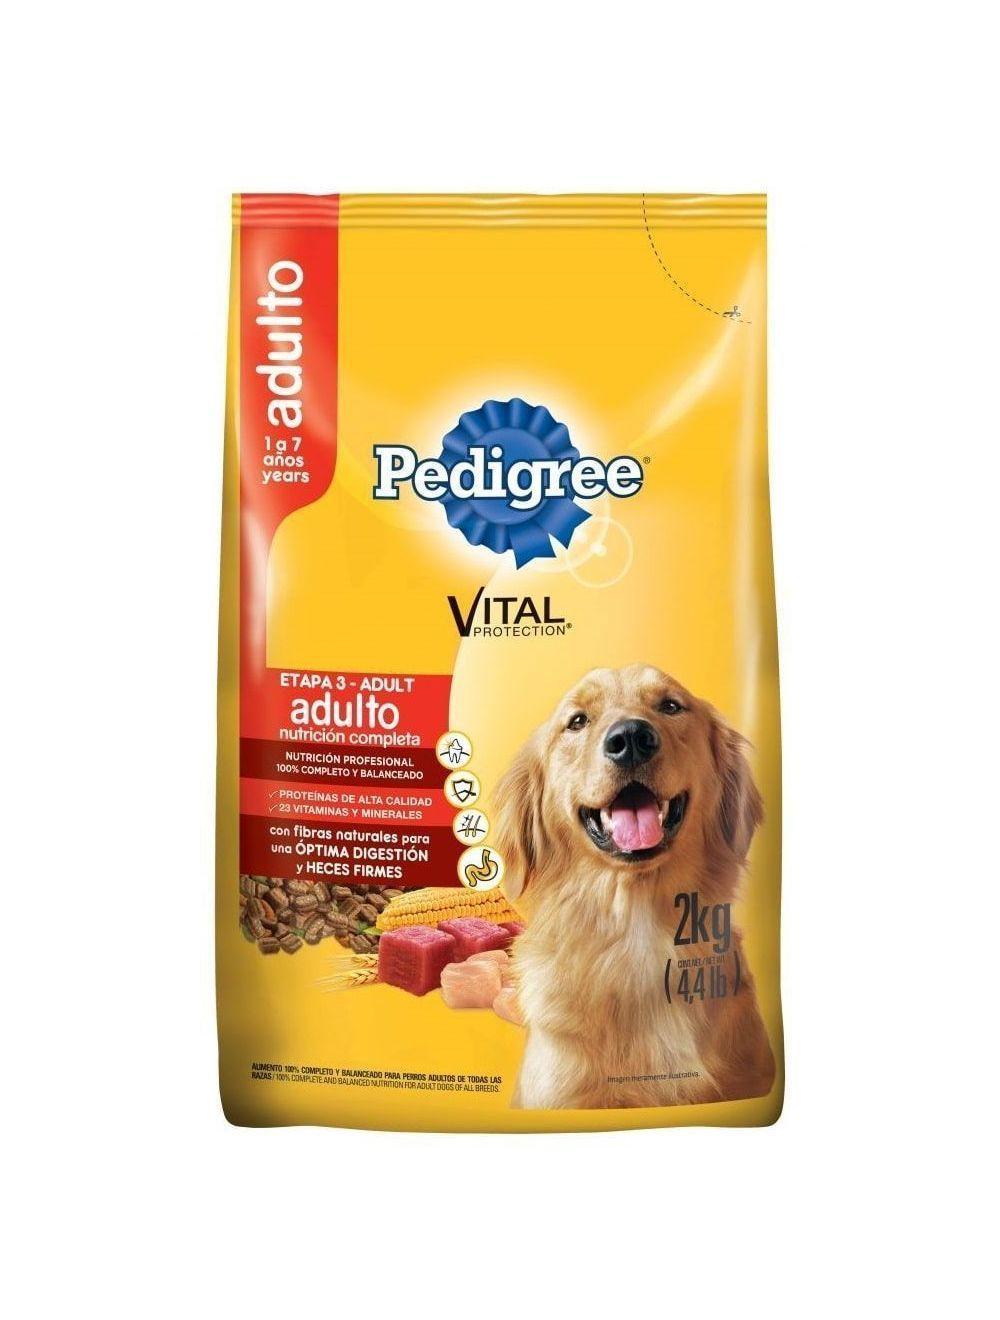 Comida para Perro Pedigree Adulto Etapa 3 - Ciudaddemascotas.com